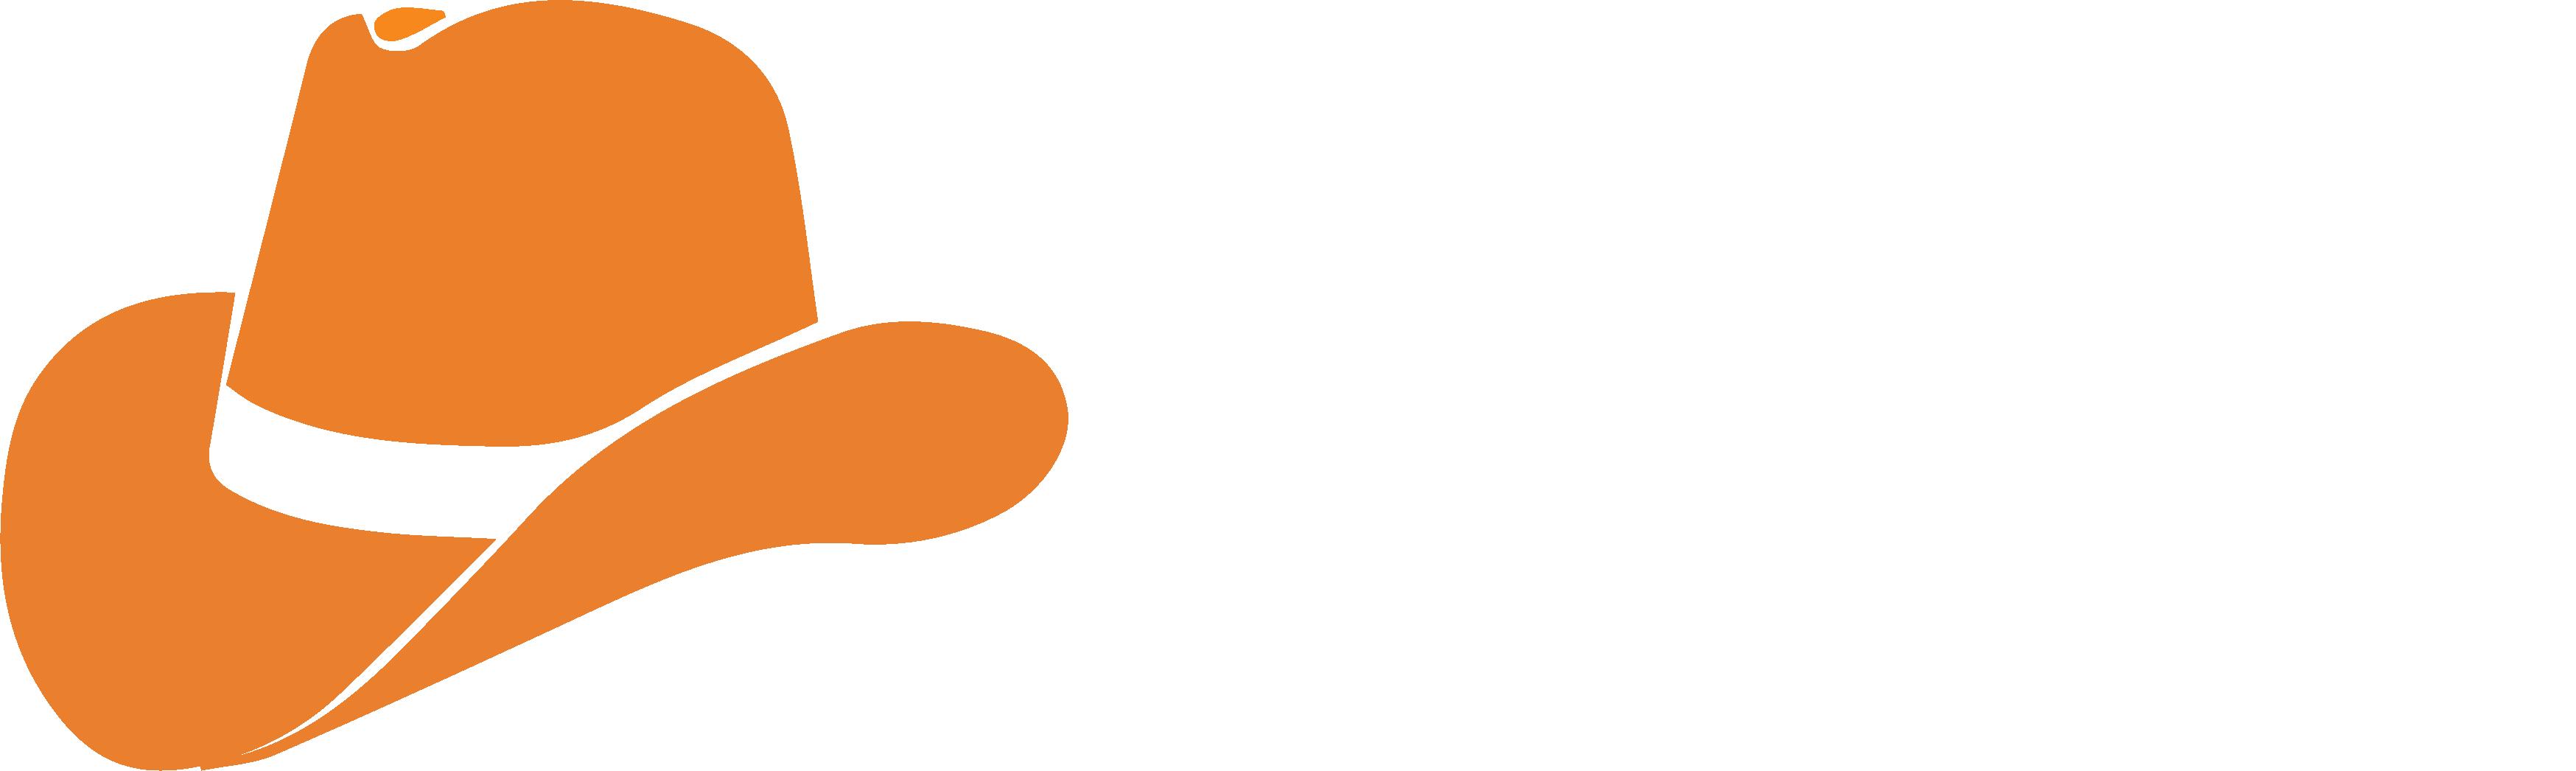 Equipment Cowboy